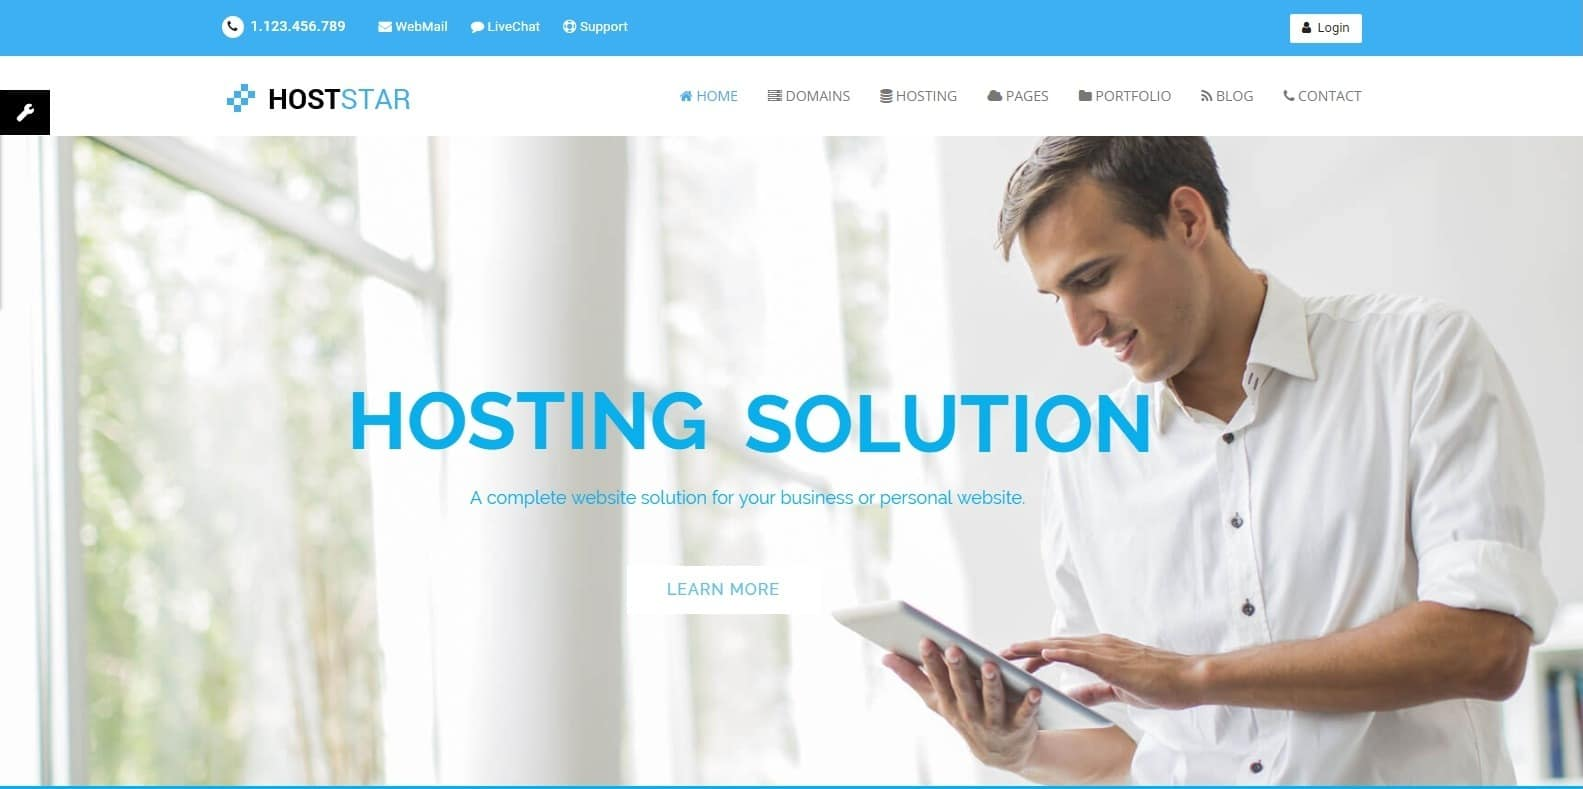 hoststar-bootstrap-hosting-template